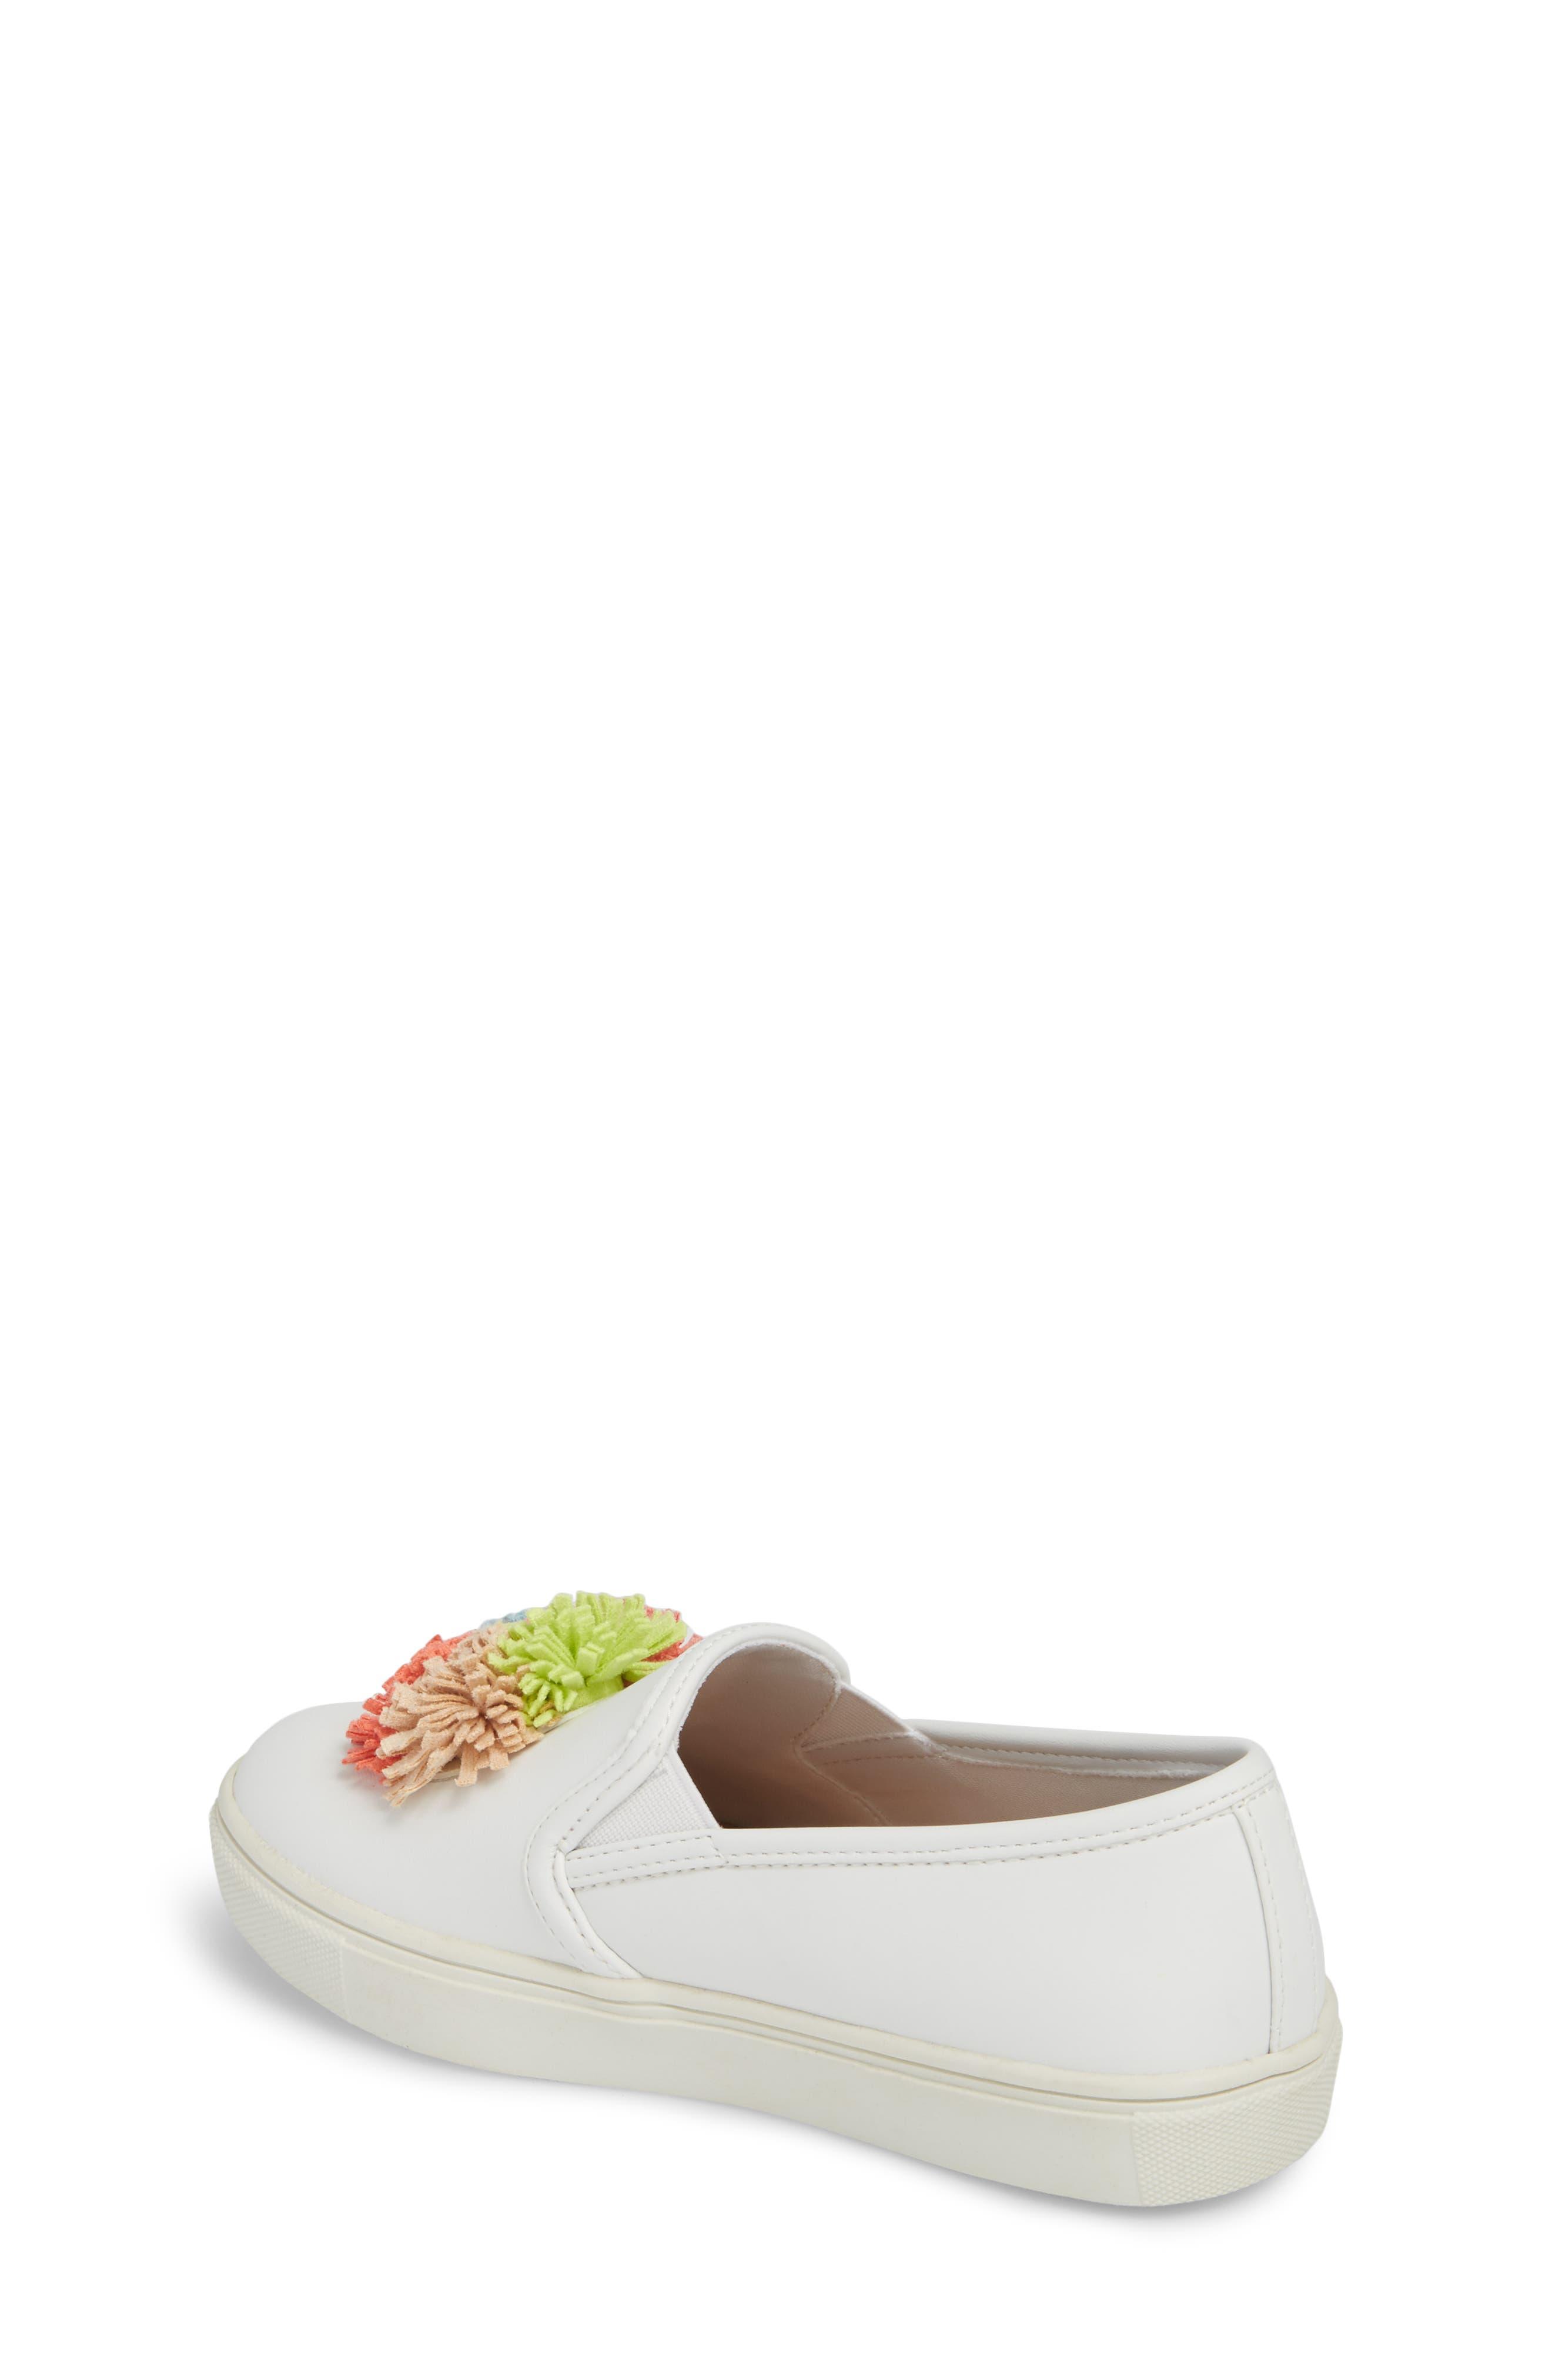 Twiny Pompom Slip-On Sneaker,                             Alternate thumbnail 2, color,                             100